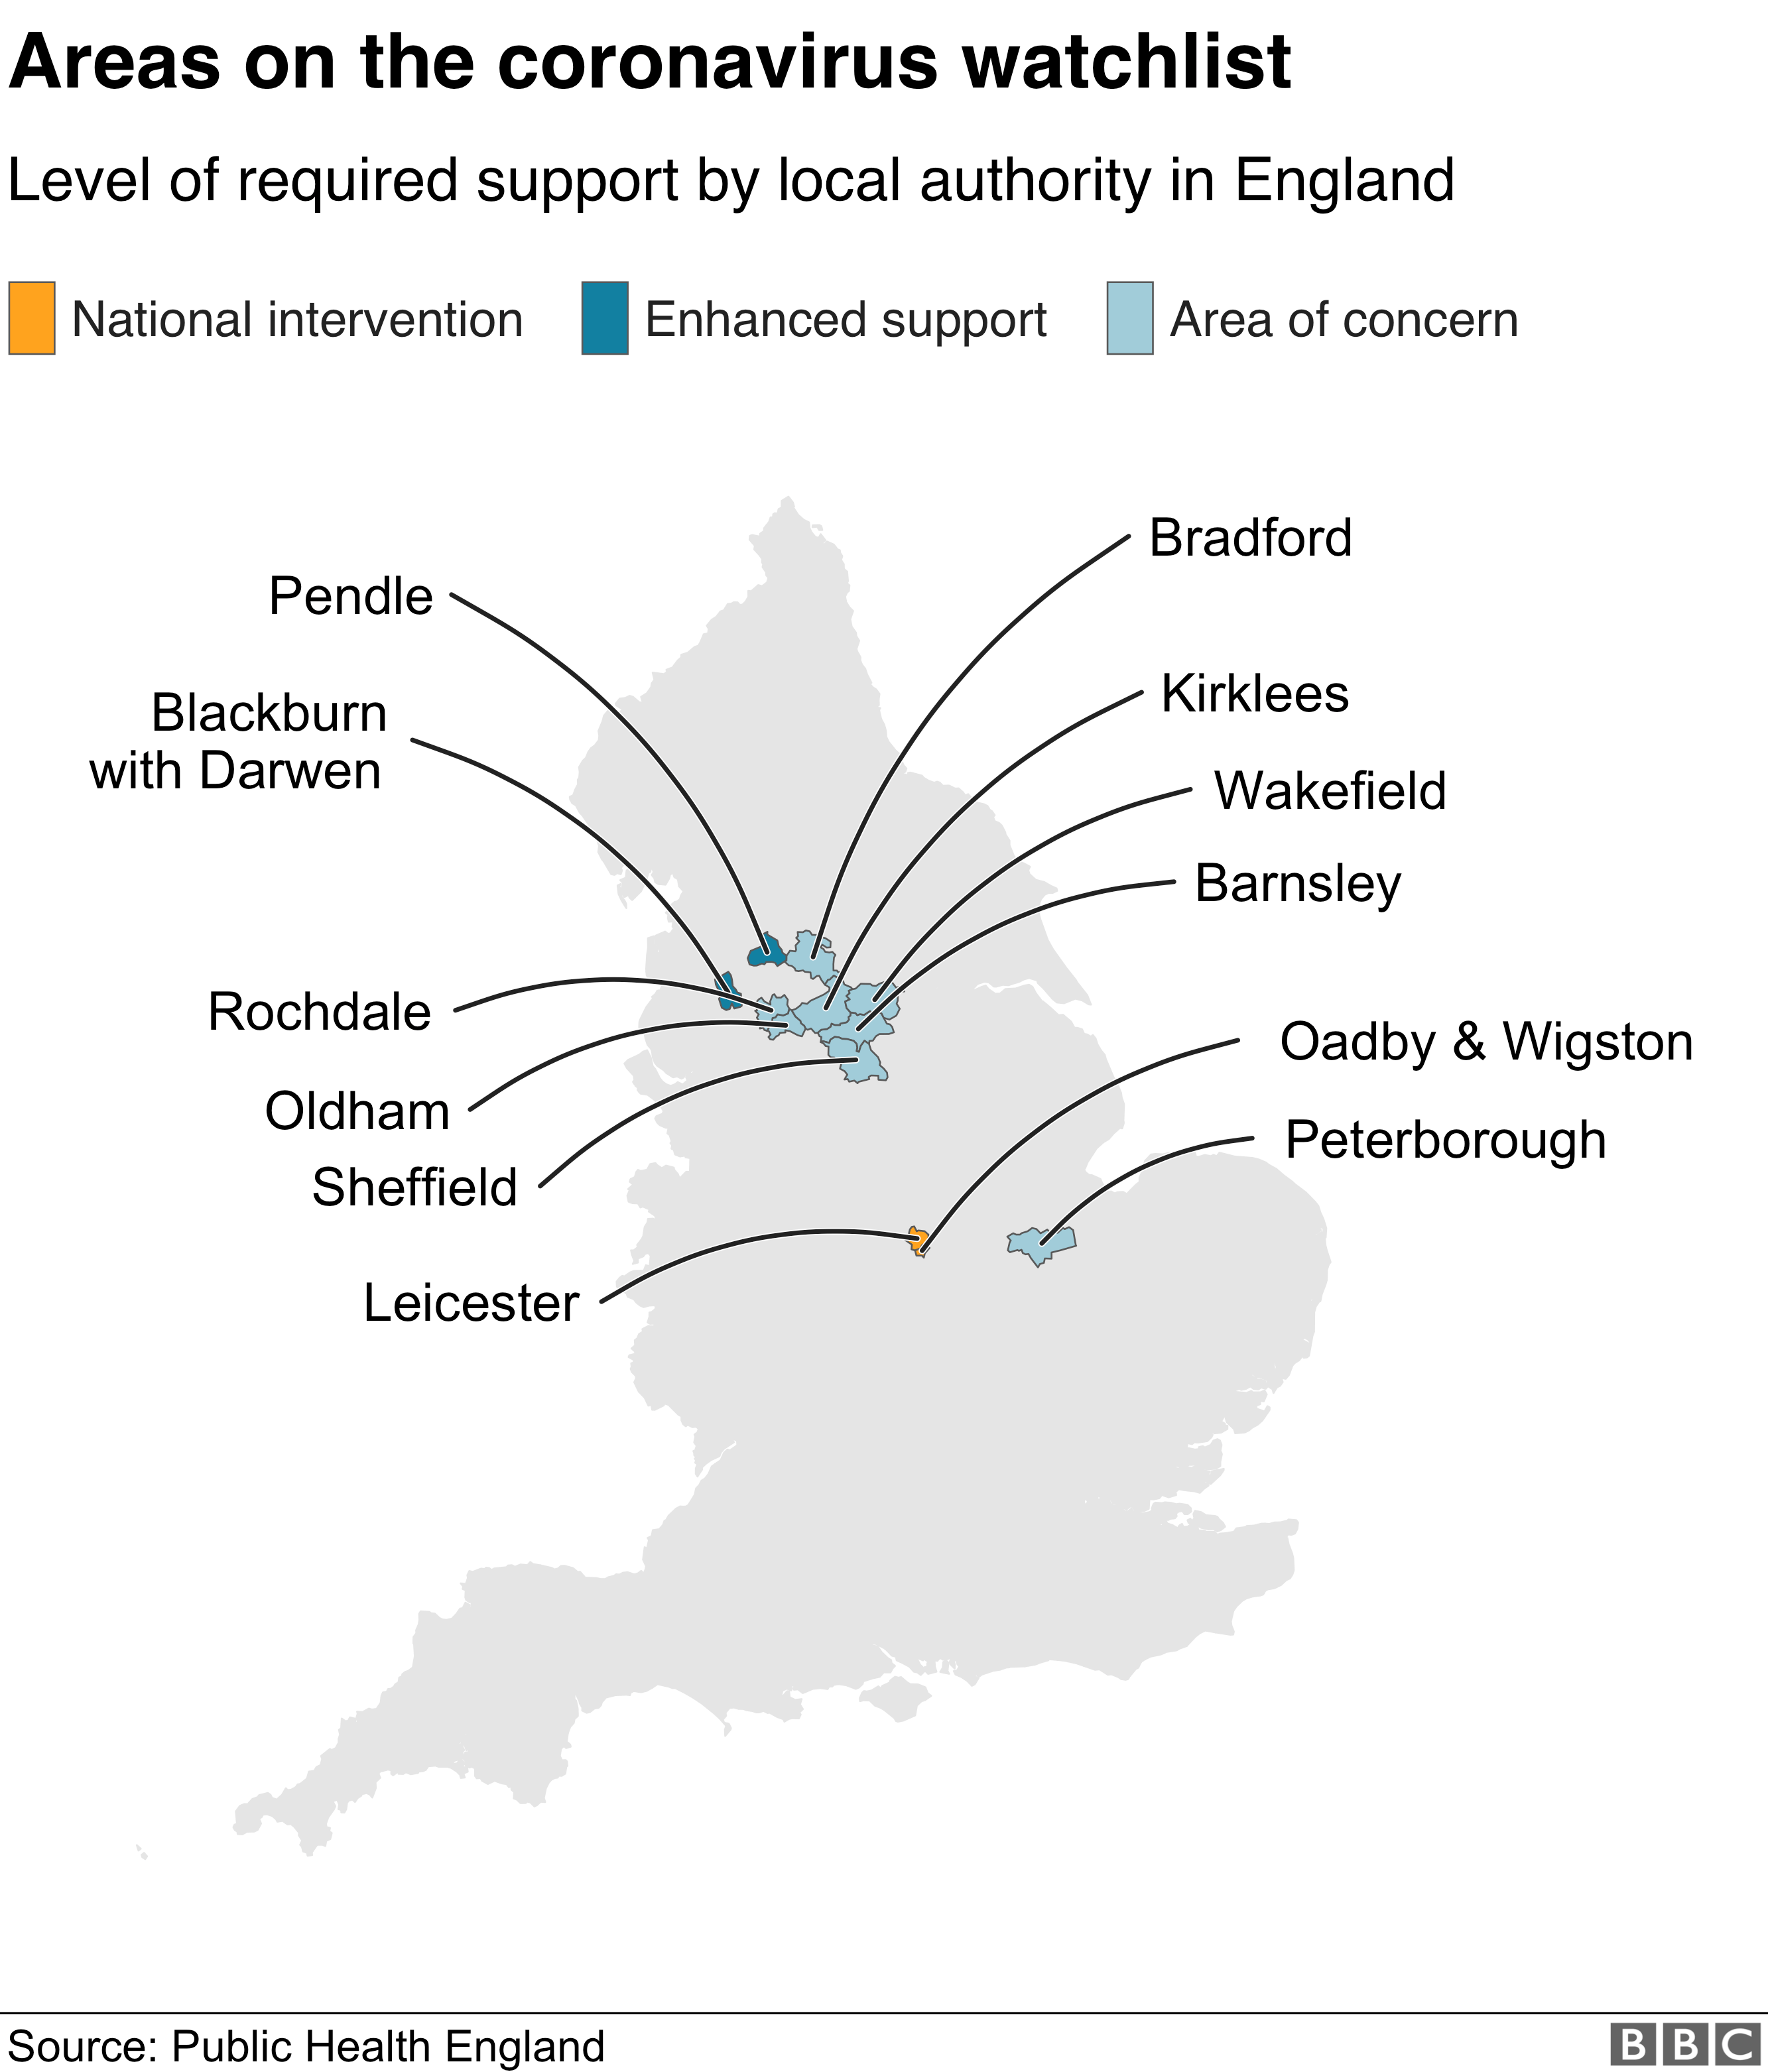 Map showing areas on coronavirus watchlist